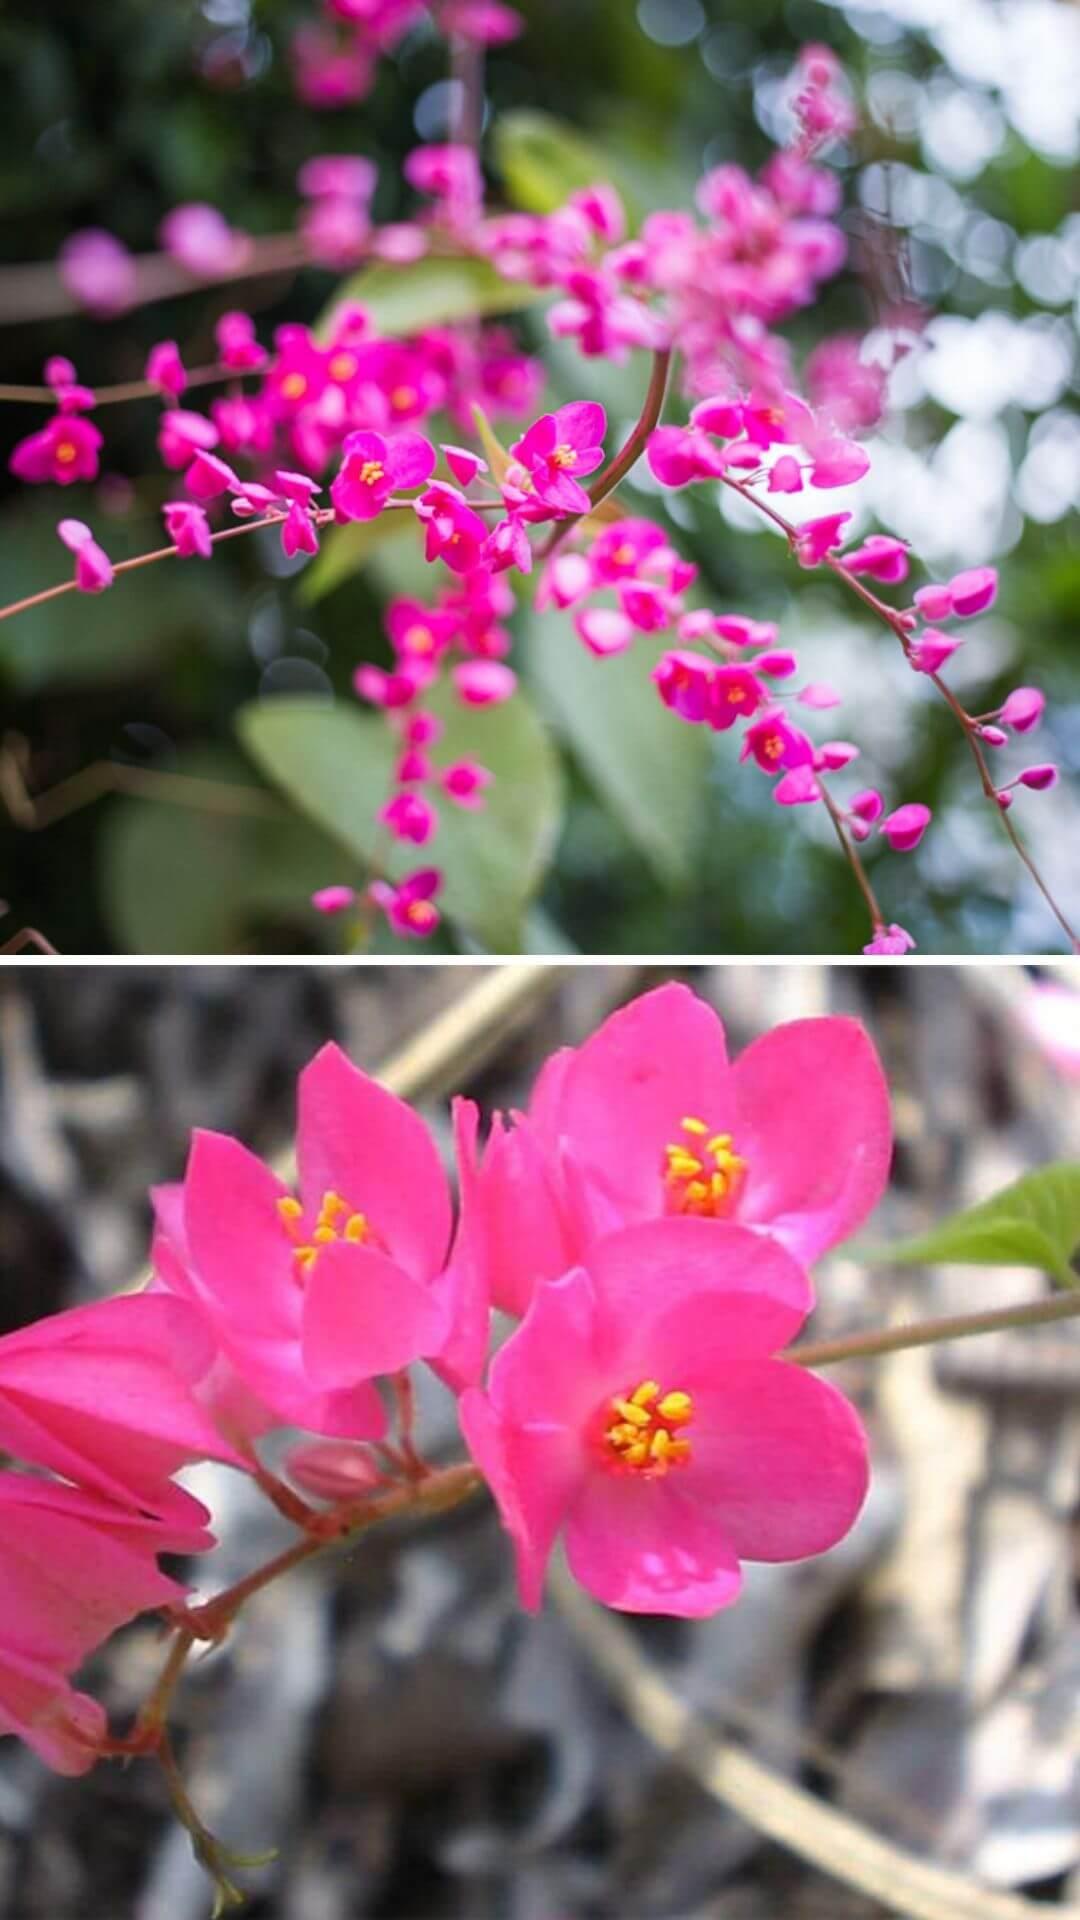 Mexican Creeper (Antigonon leptopus, Coralita, bee bush or San Miguelito vine) - Heat and Drought Tolerant Plants for Landscaping